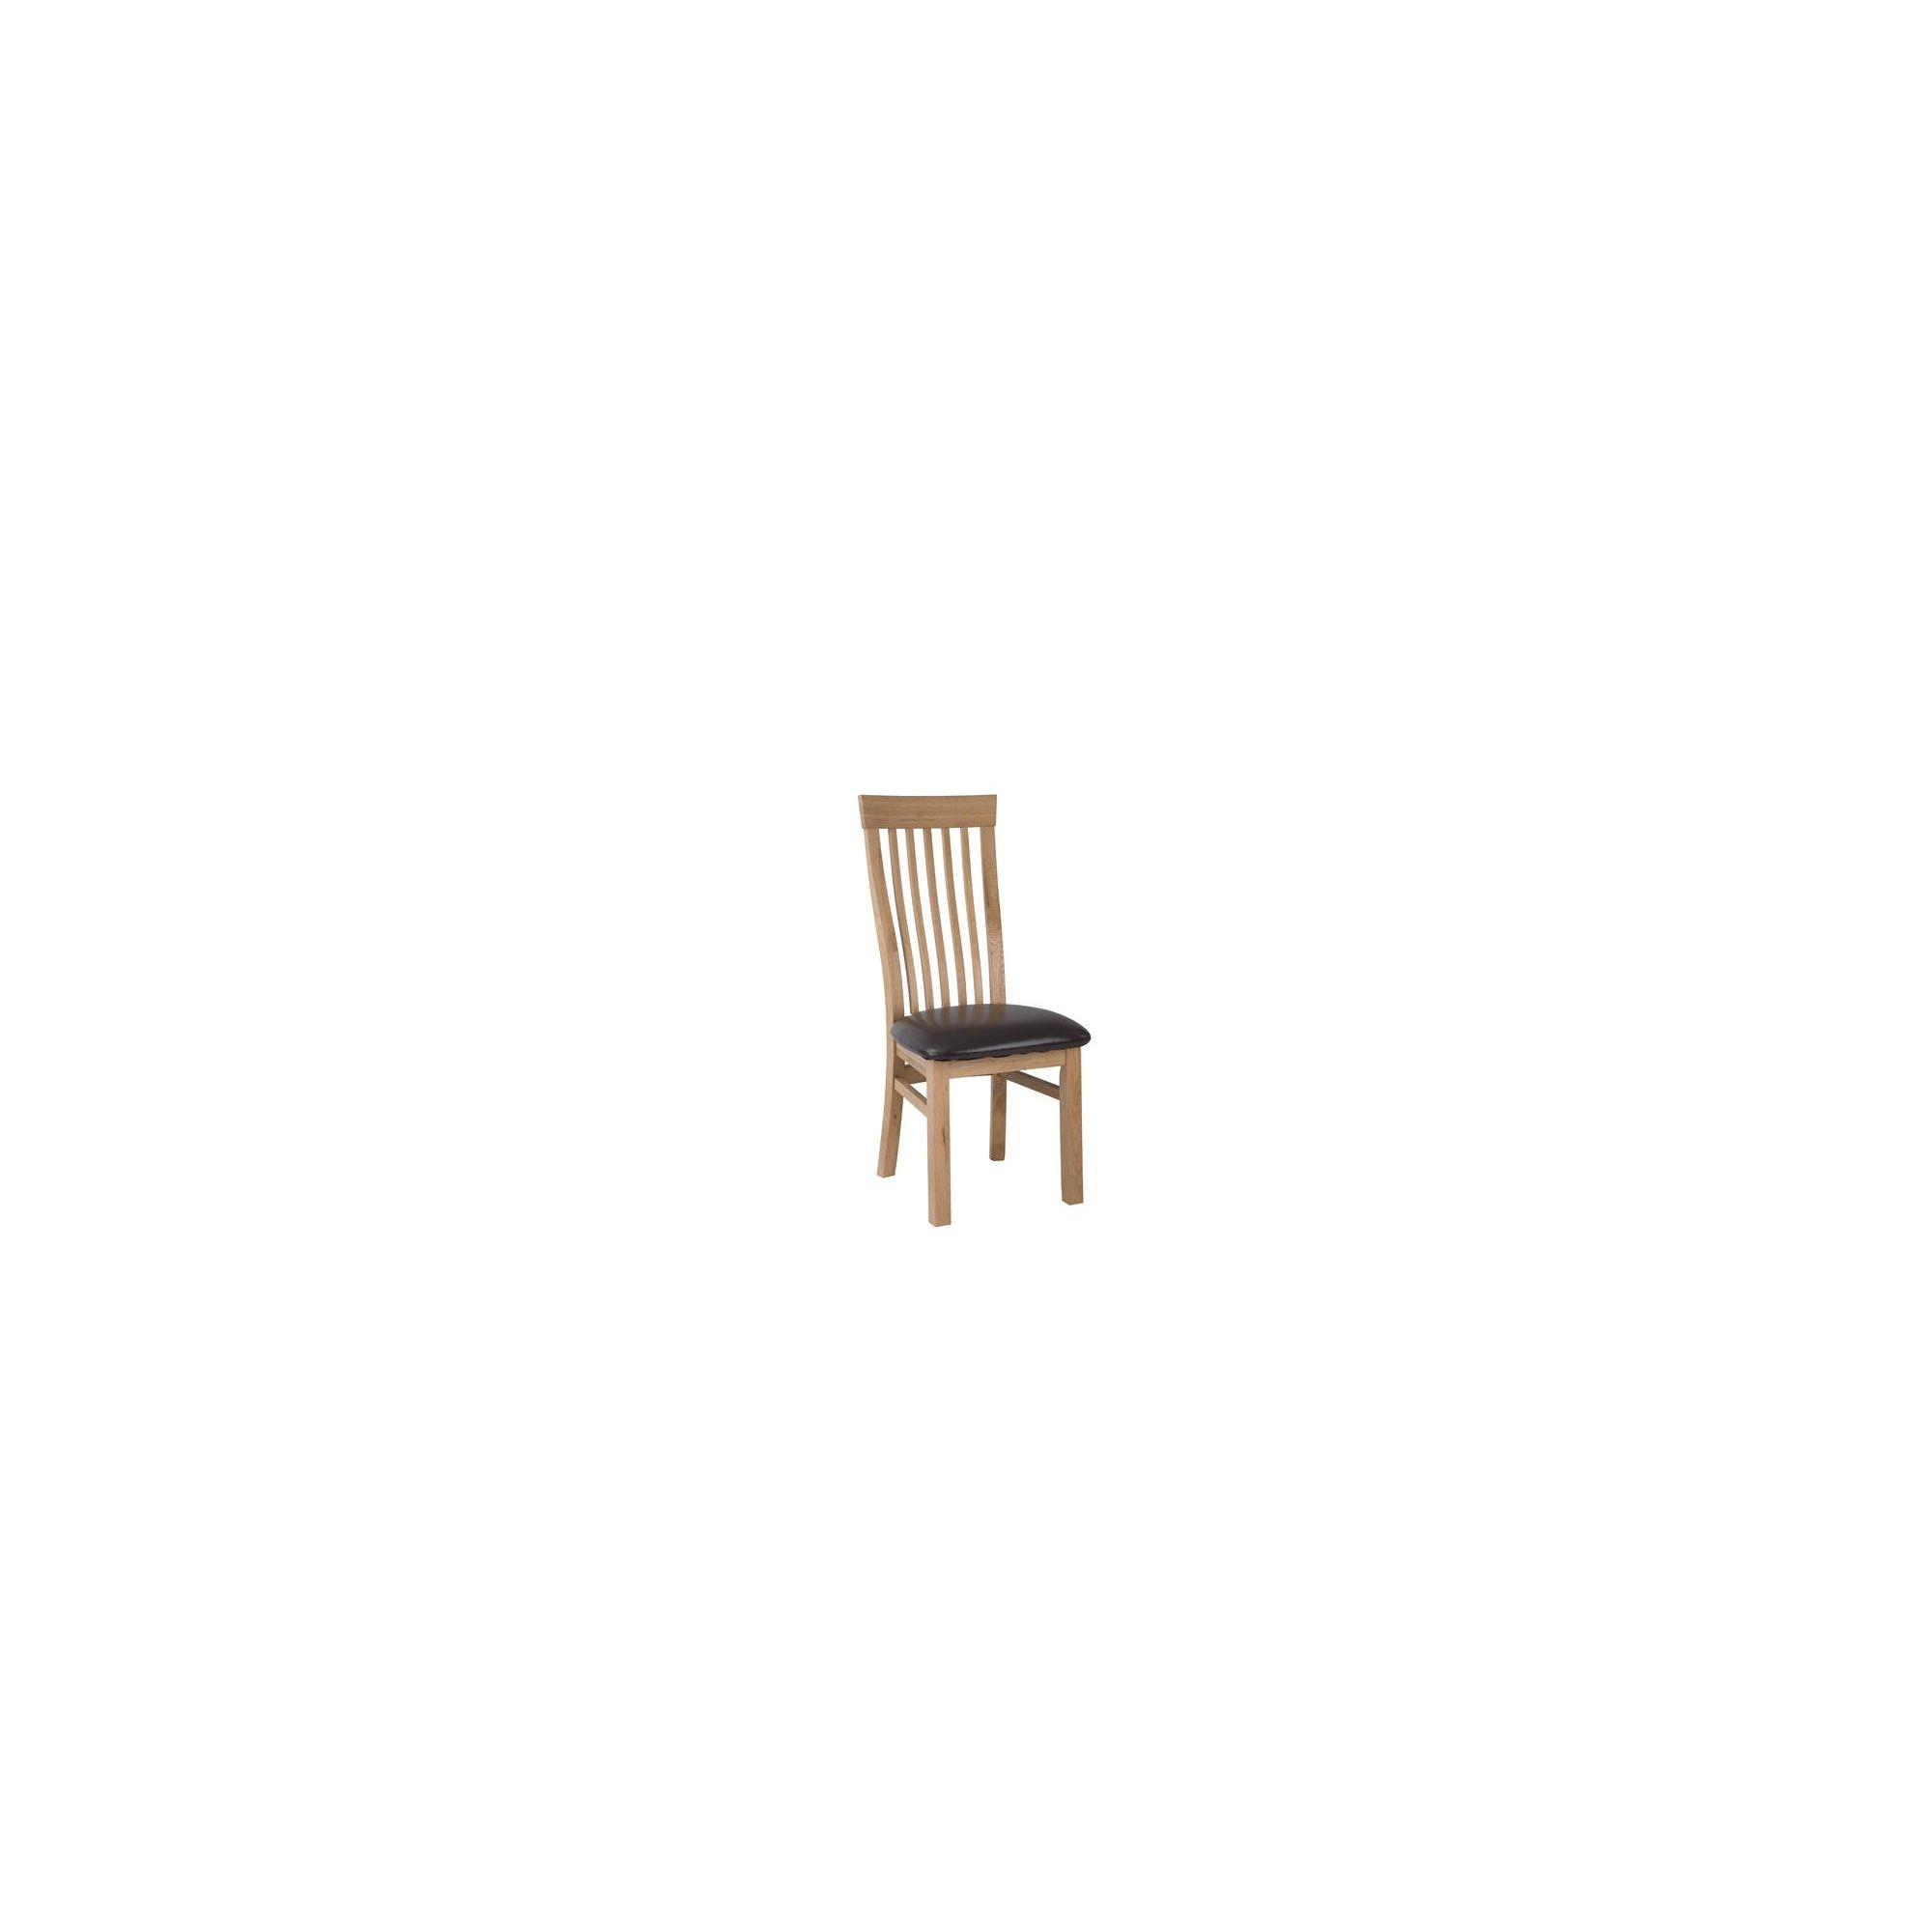 Oakinsen Newtown Dining Chair (Set of 2)